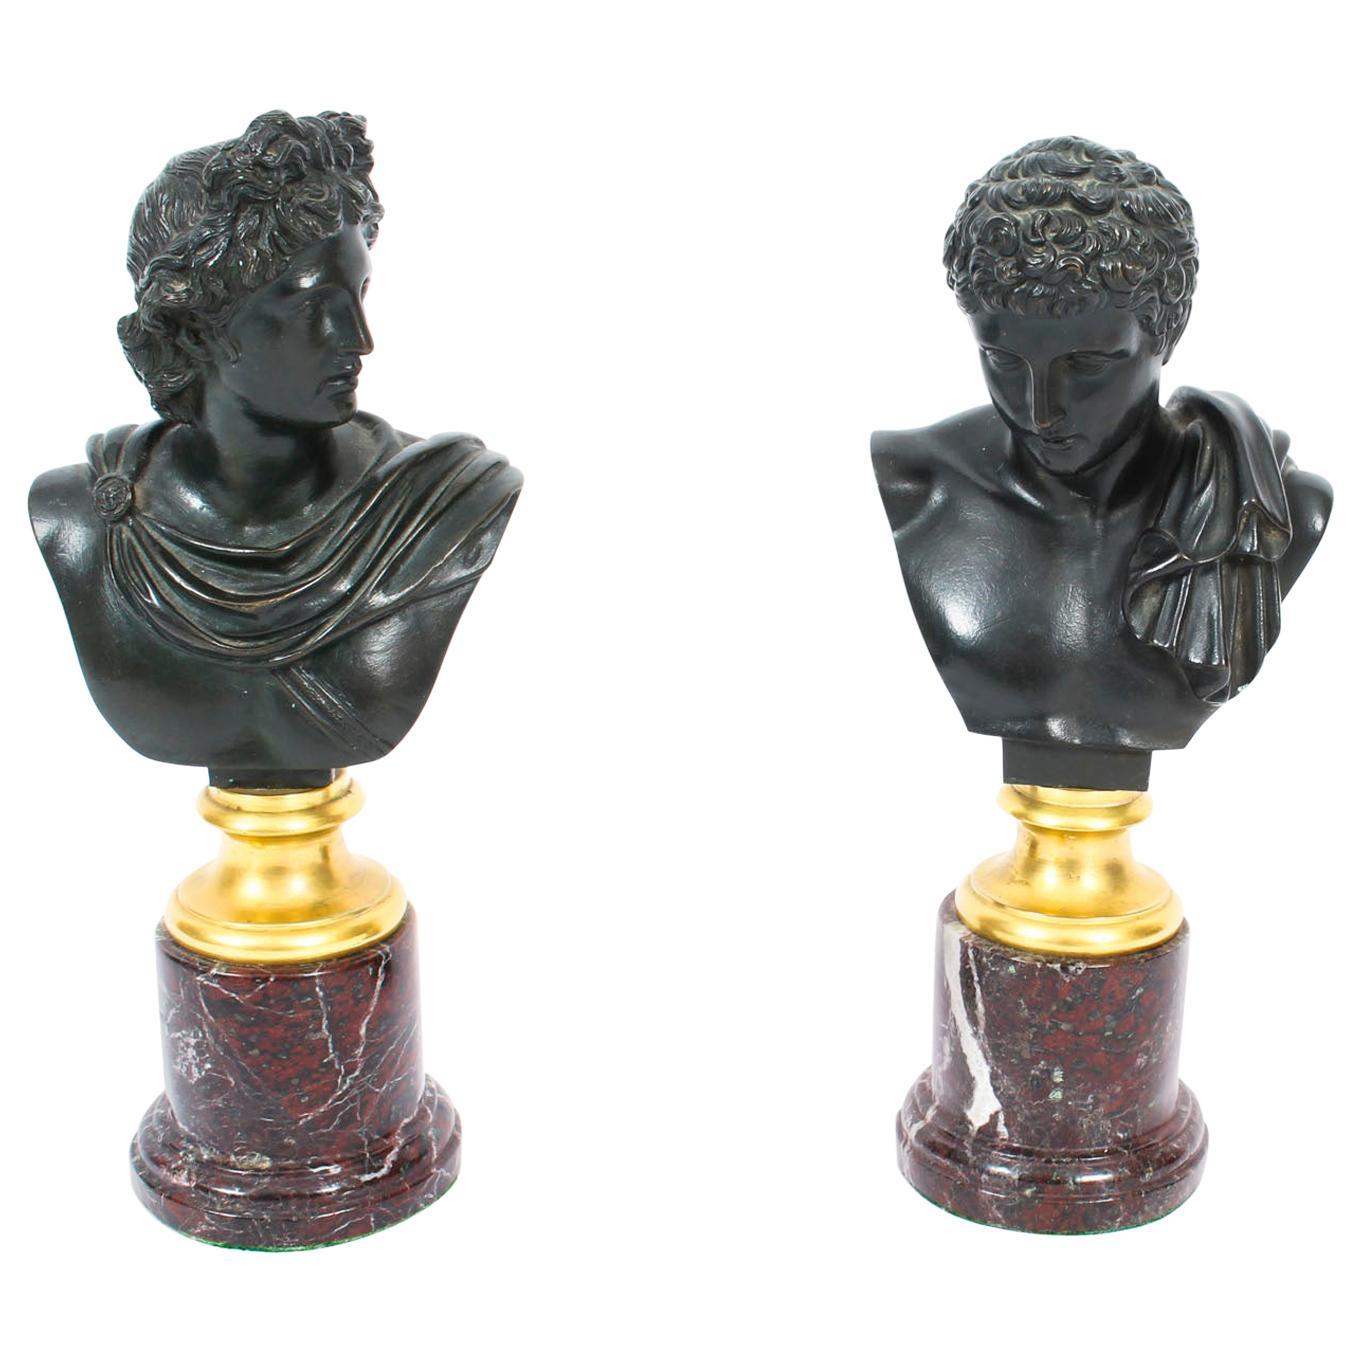 Antique Pair of French Grand Tour Bronze Busts Mercury & Apollo, 19th Century